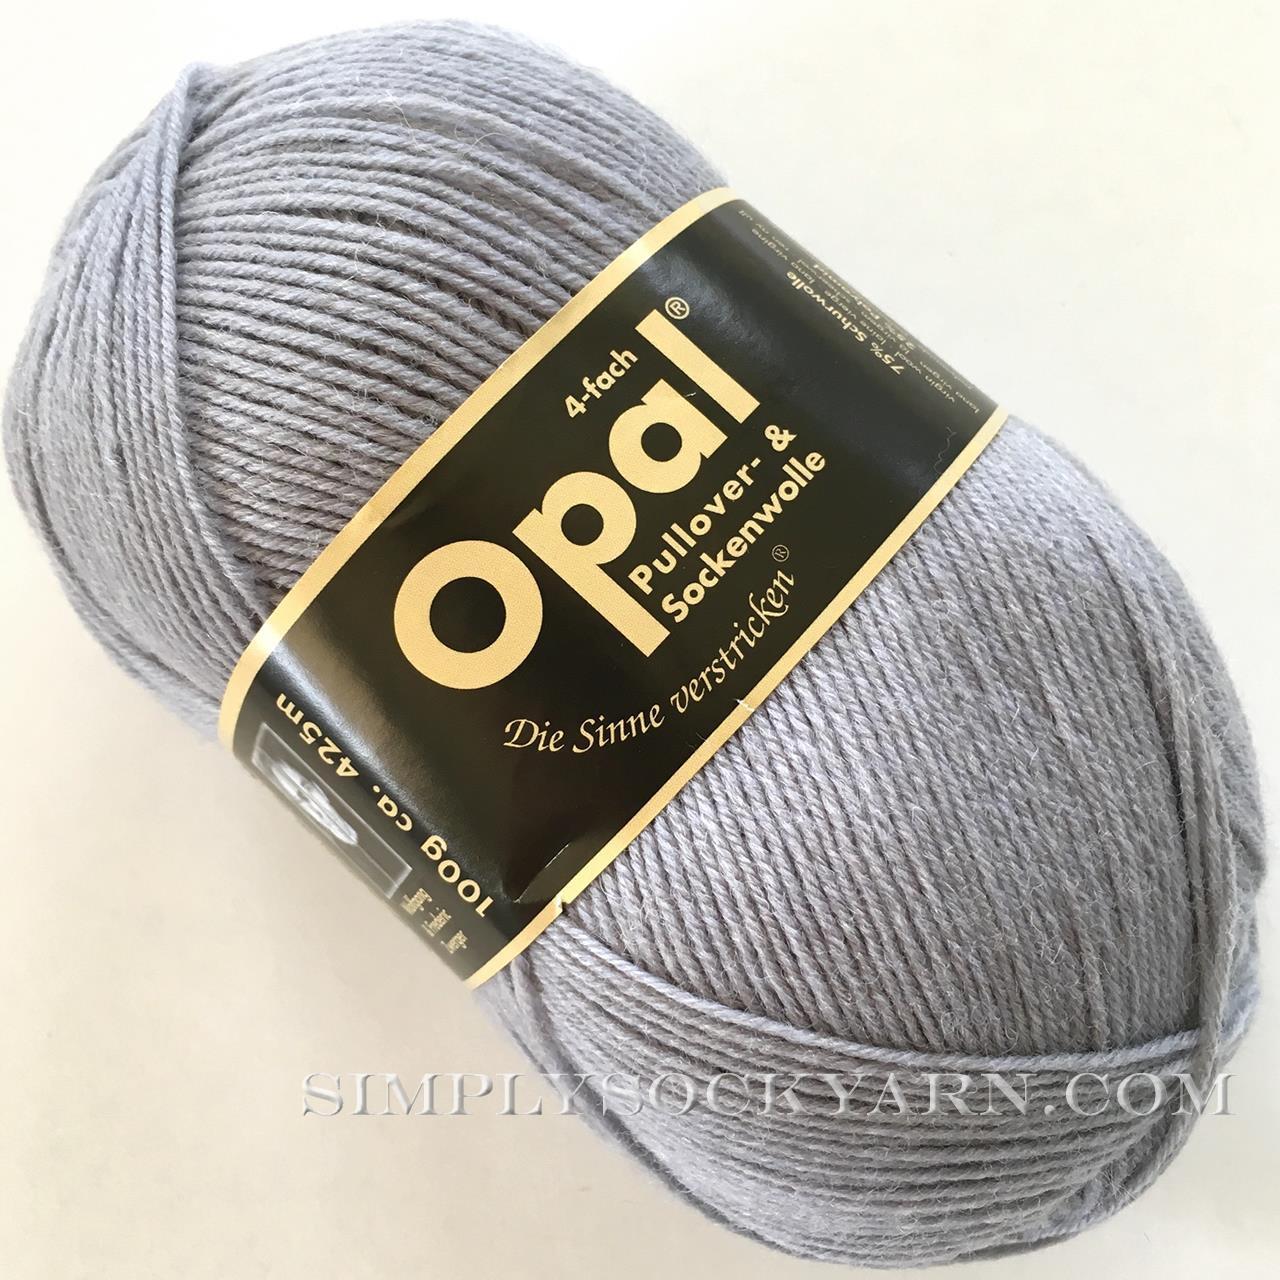 Opal Uni Solid 5193 Med Gray -